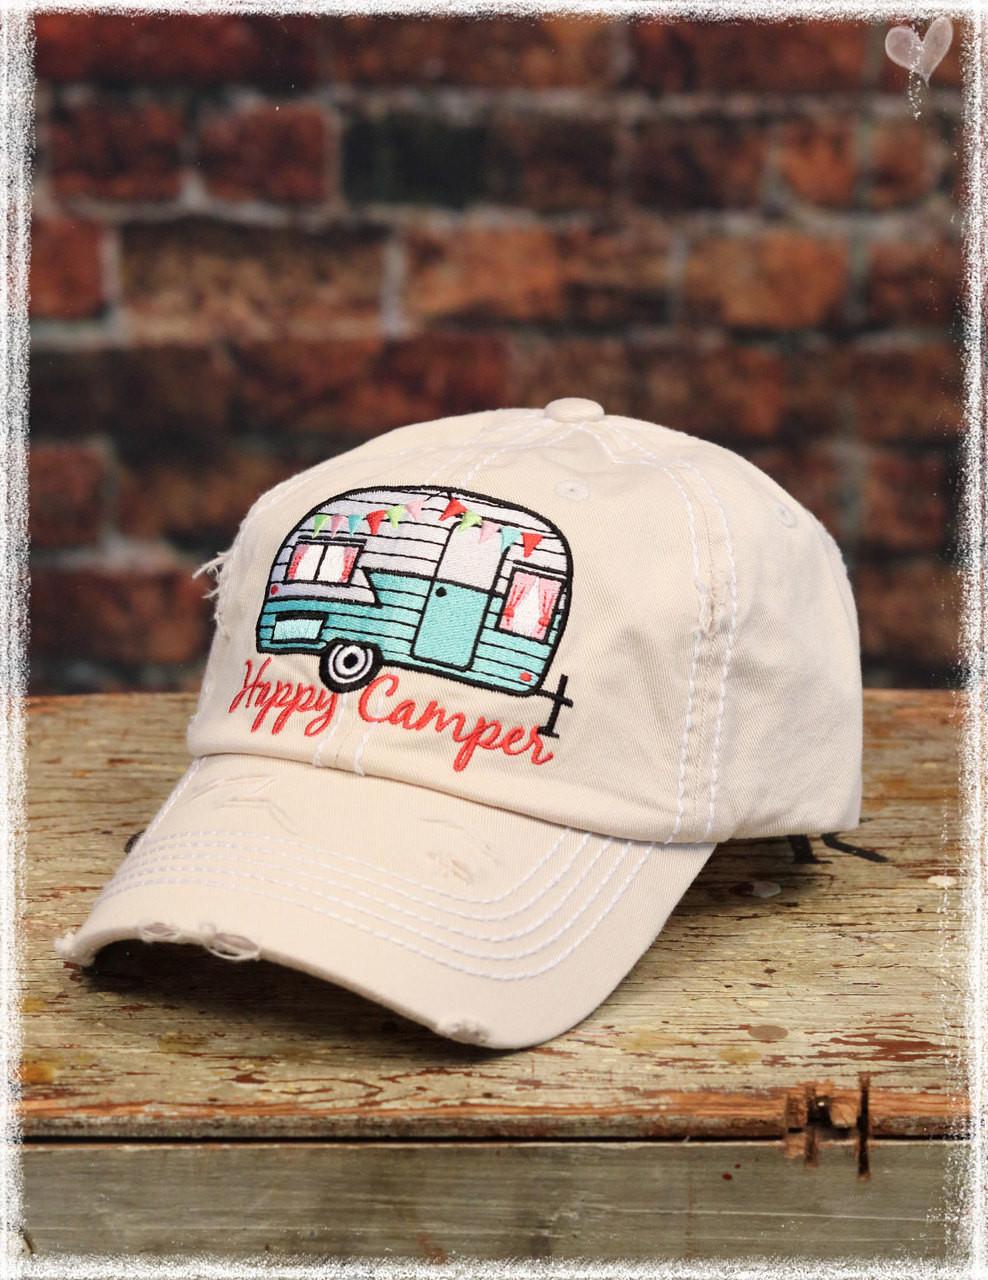 Khaki Happy Camper baseball hat by Dang Chicks